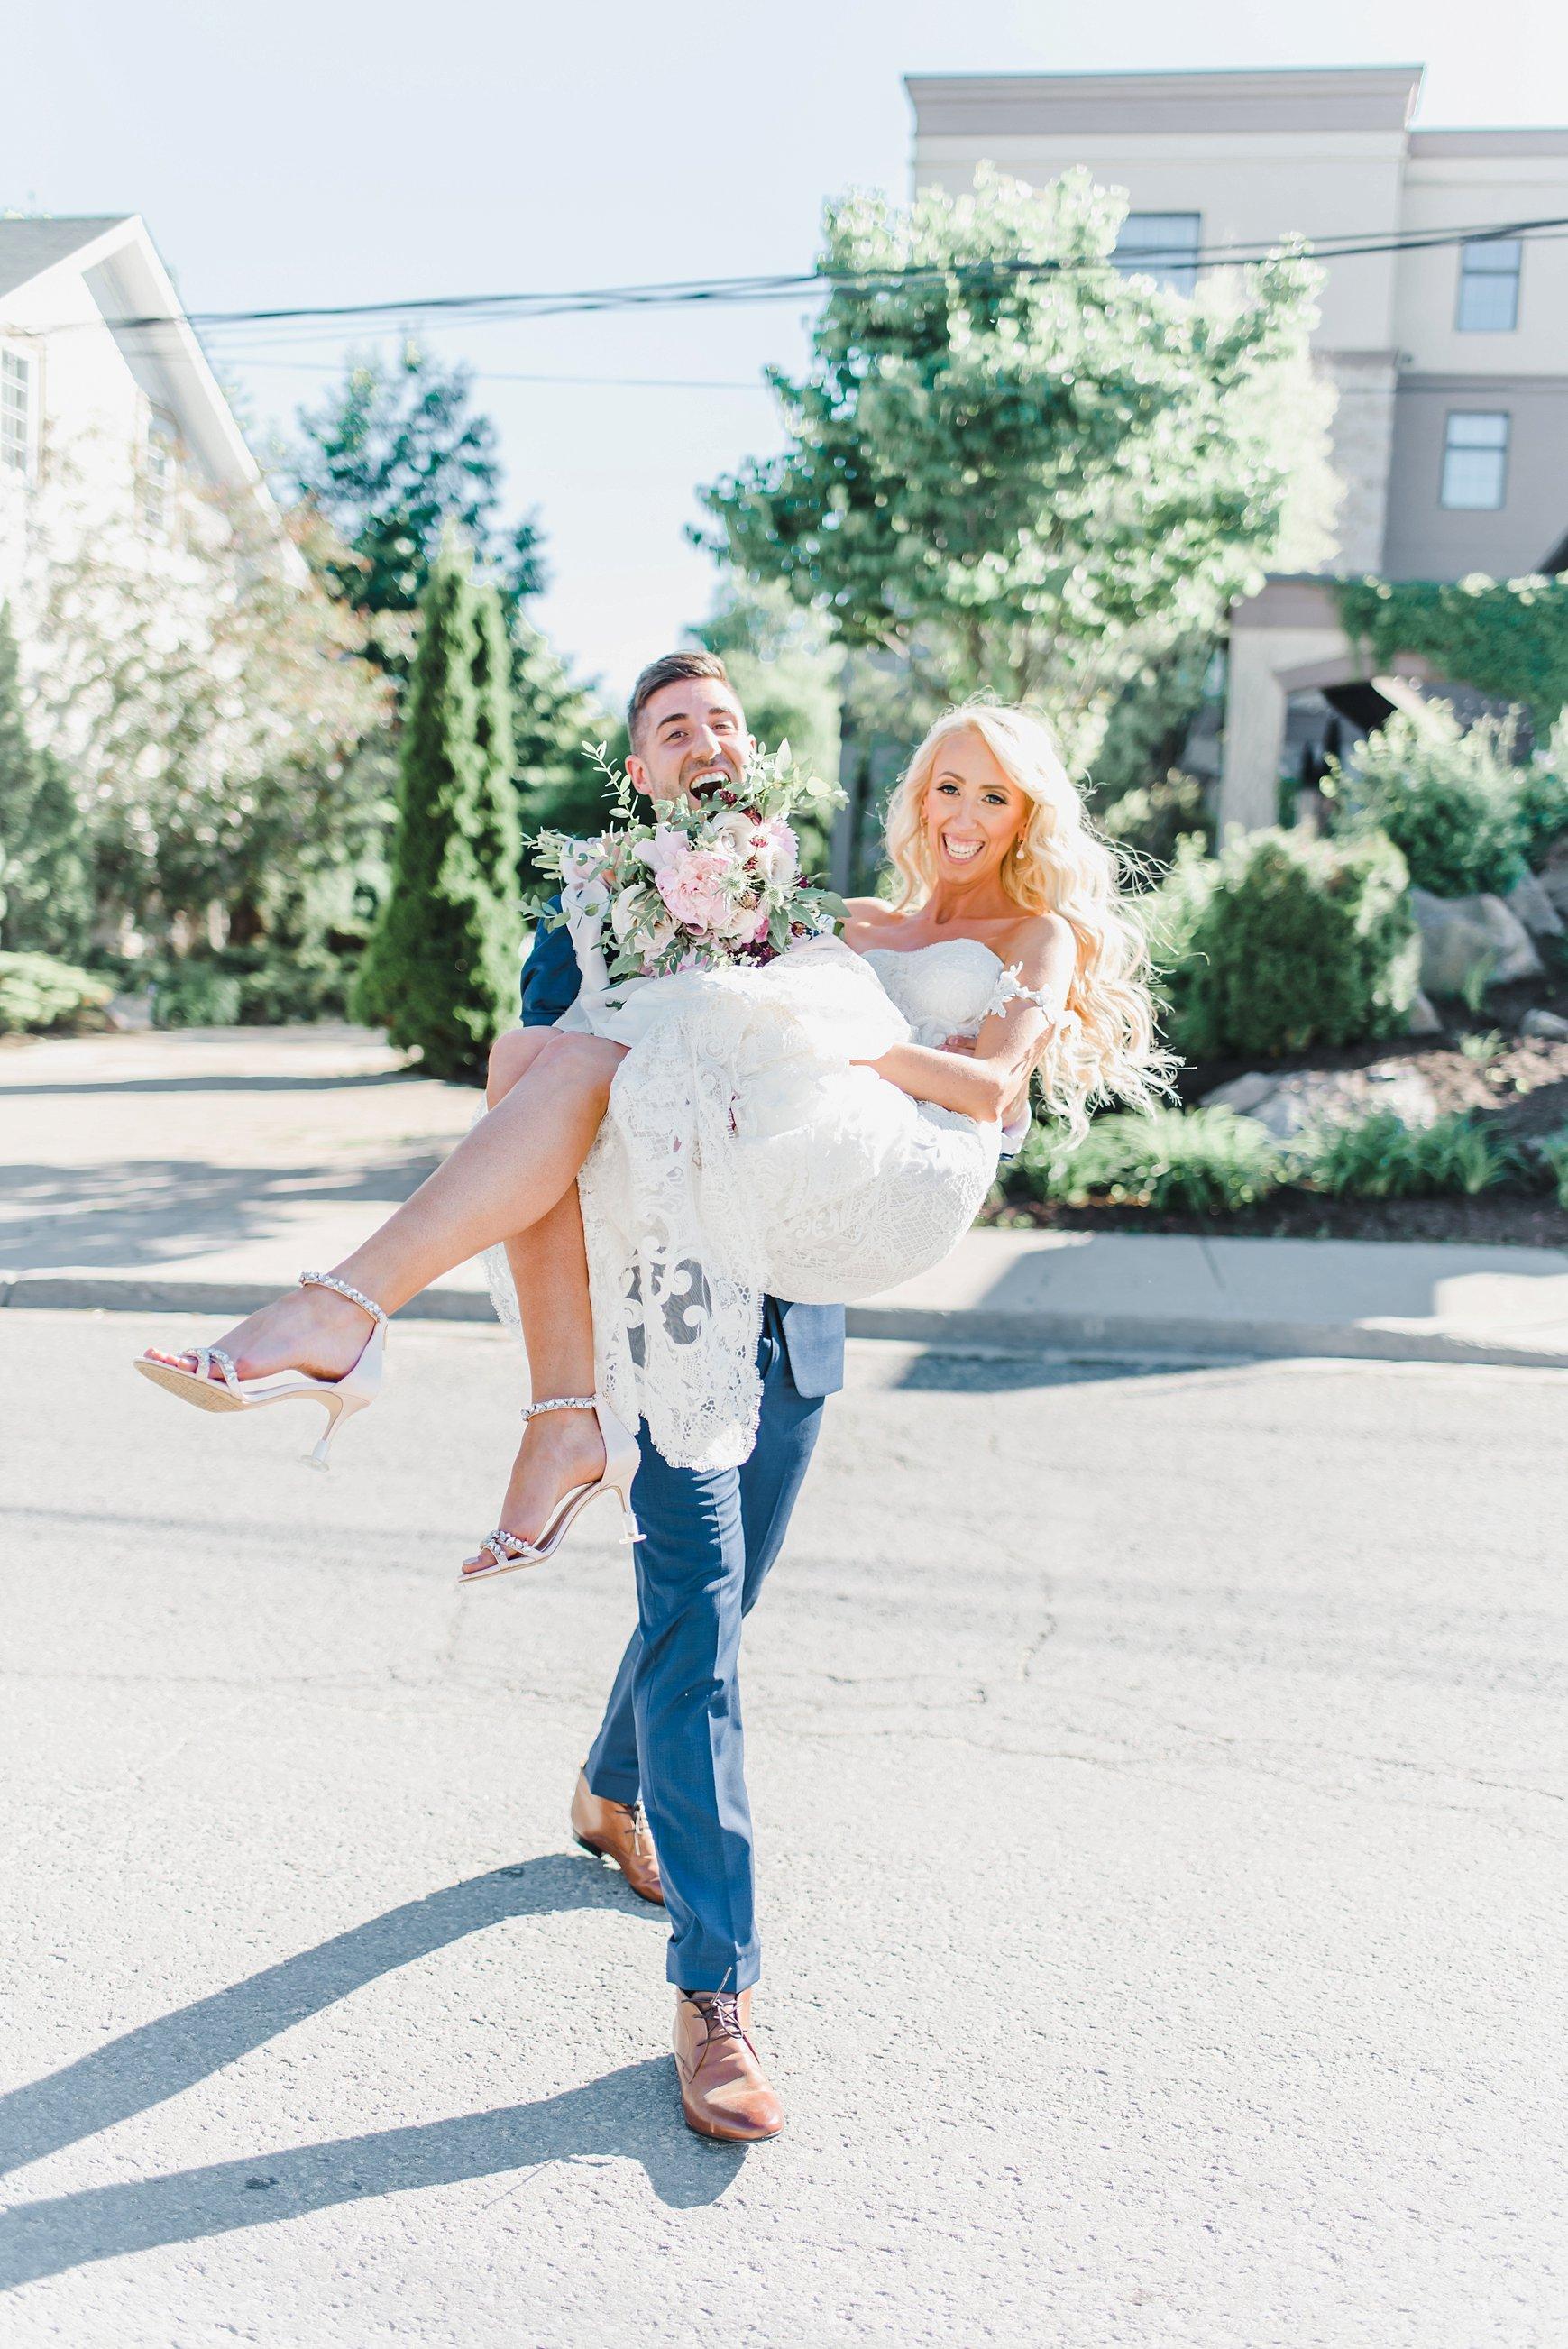 light airy indie fine art ottawa wedding photographer | Ali and Batoul Photography_0076.jpg